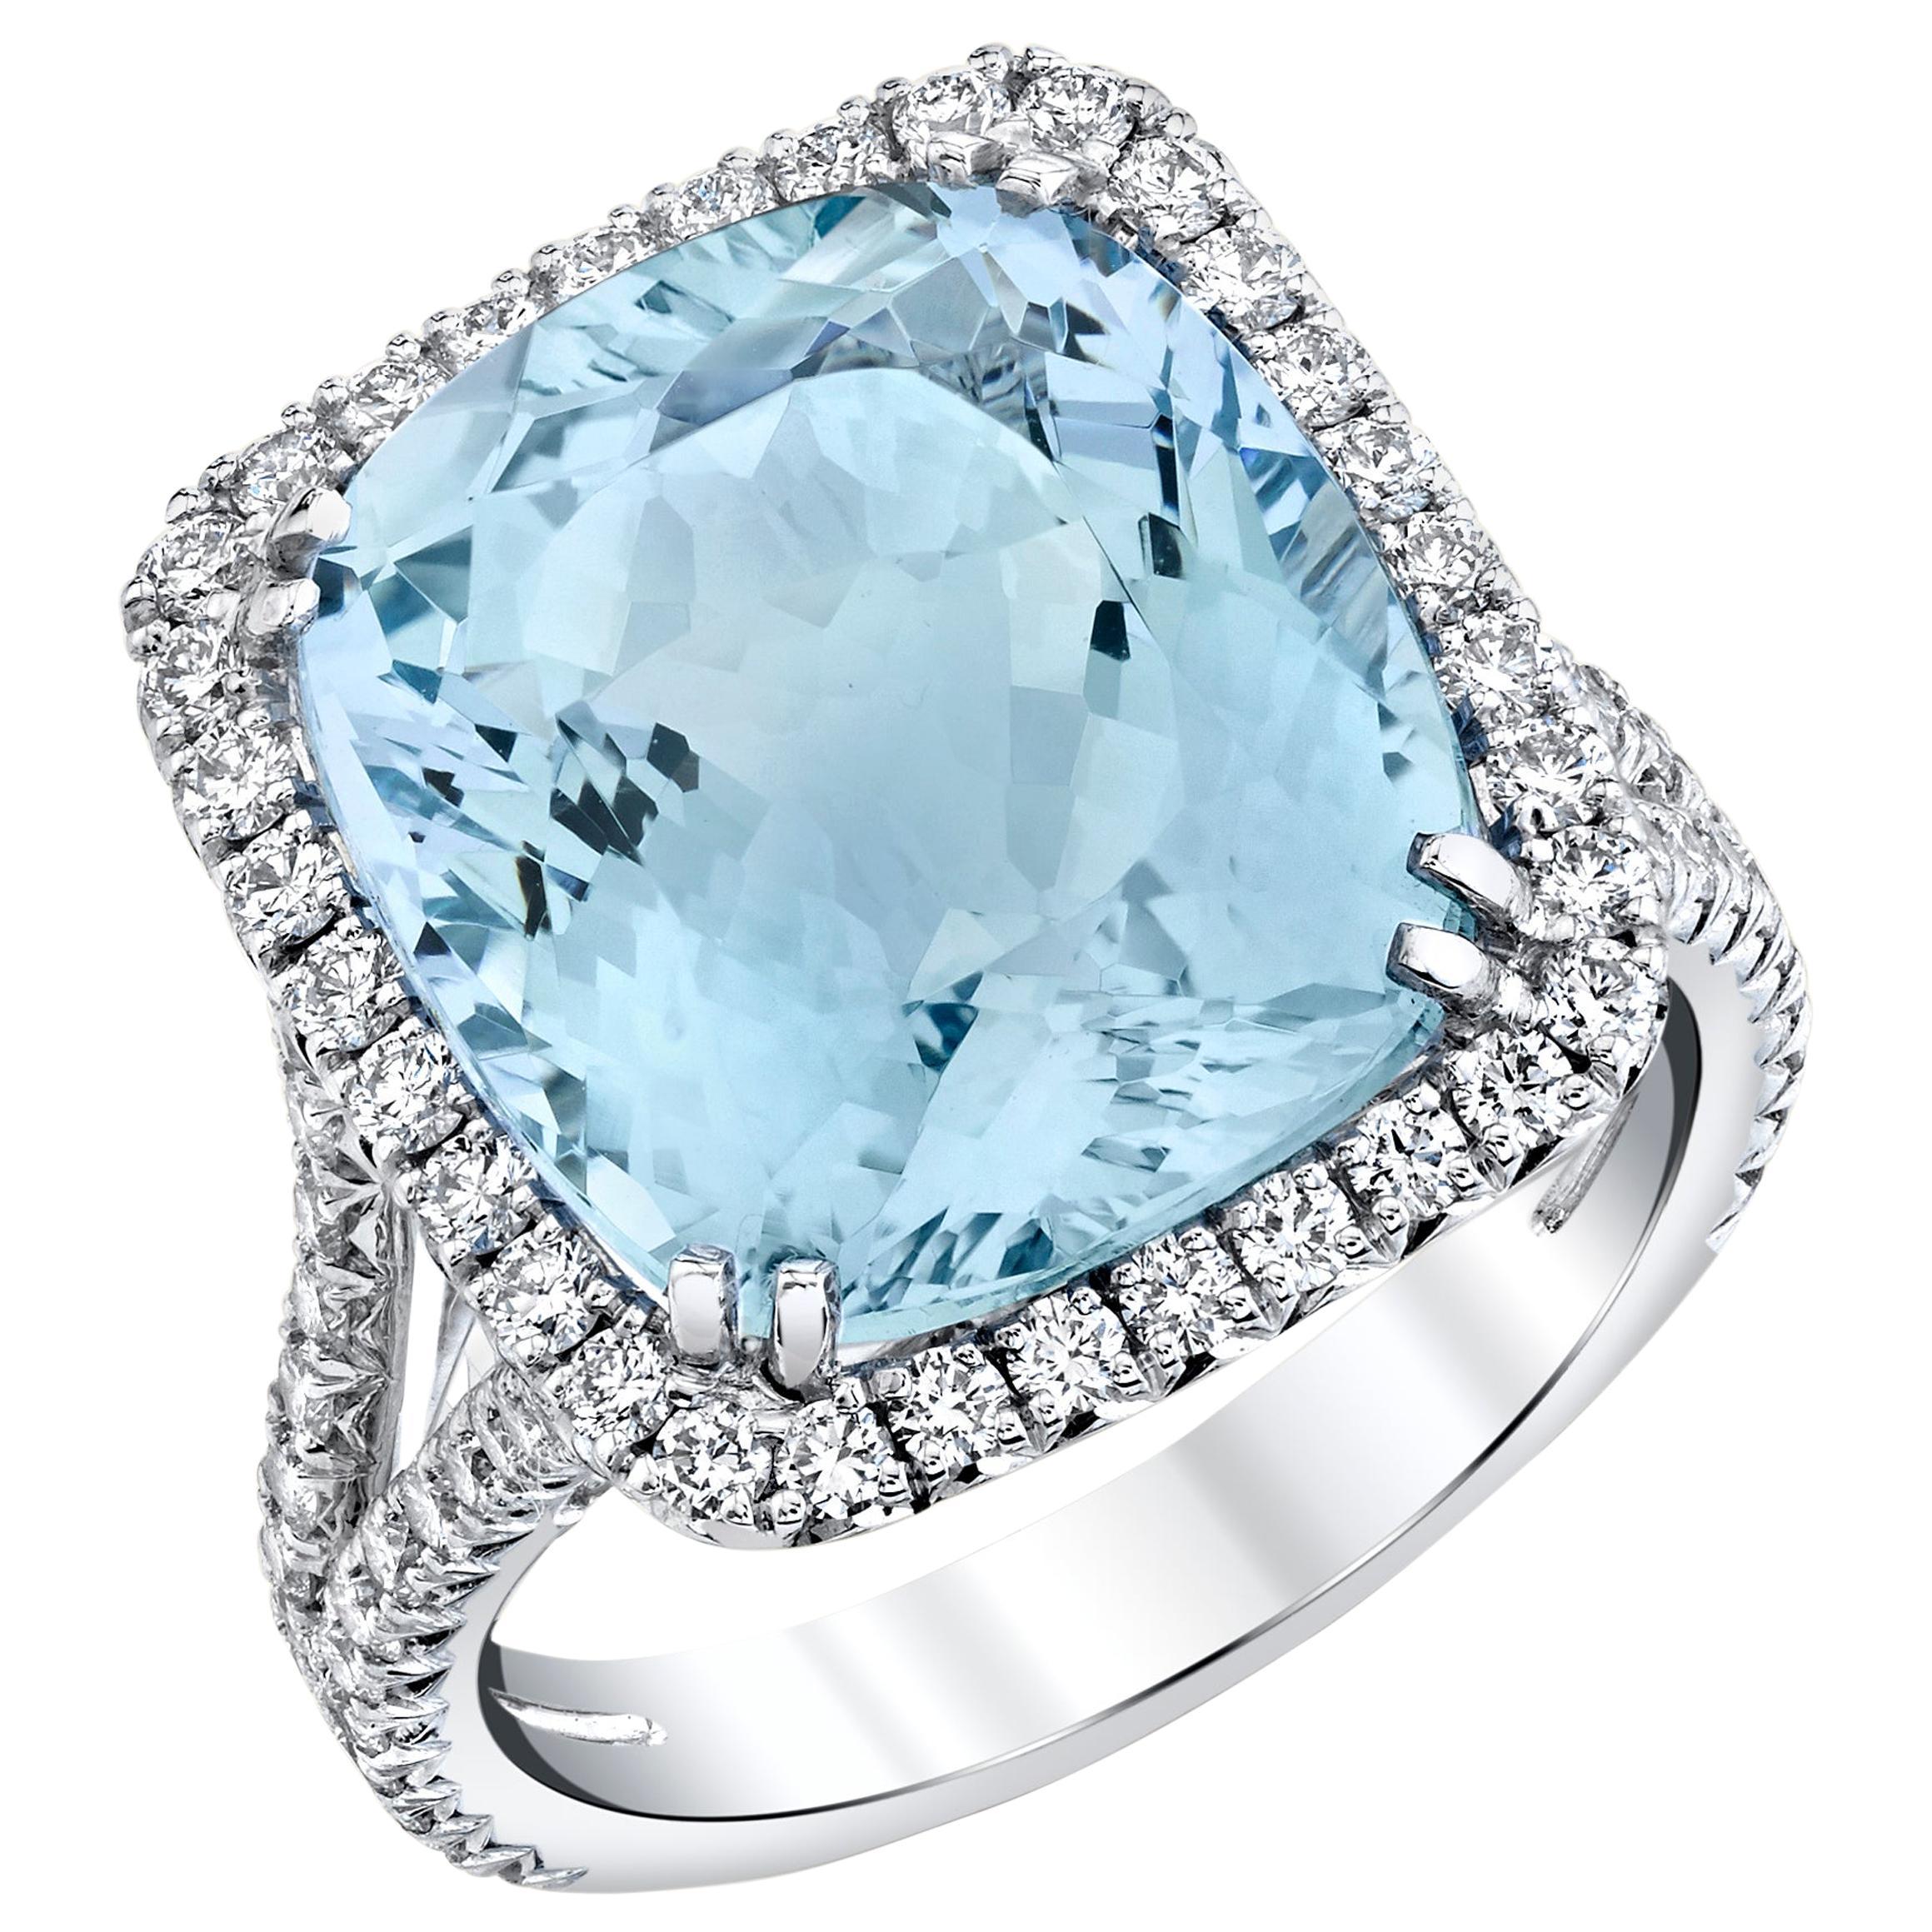 8.70 Carat Aquamarine Cushion, White Gold and Diamond Halo Cocktail Ring